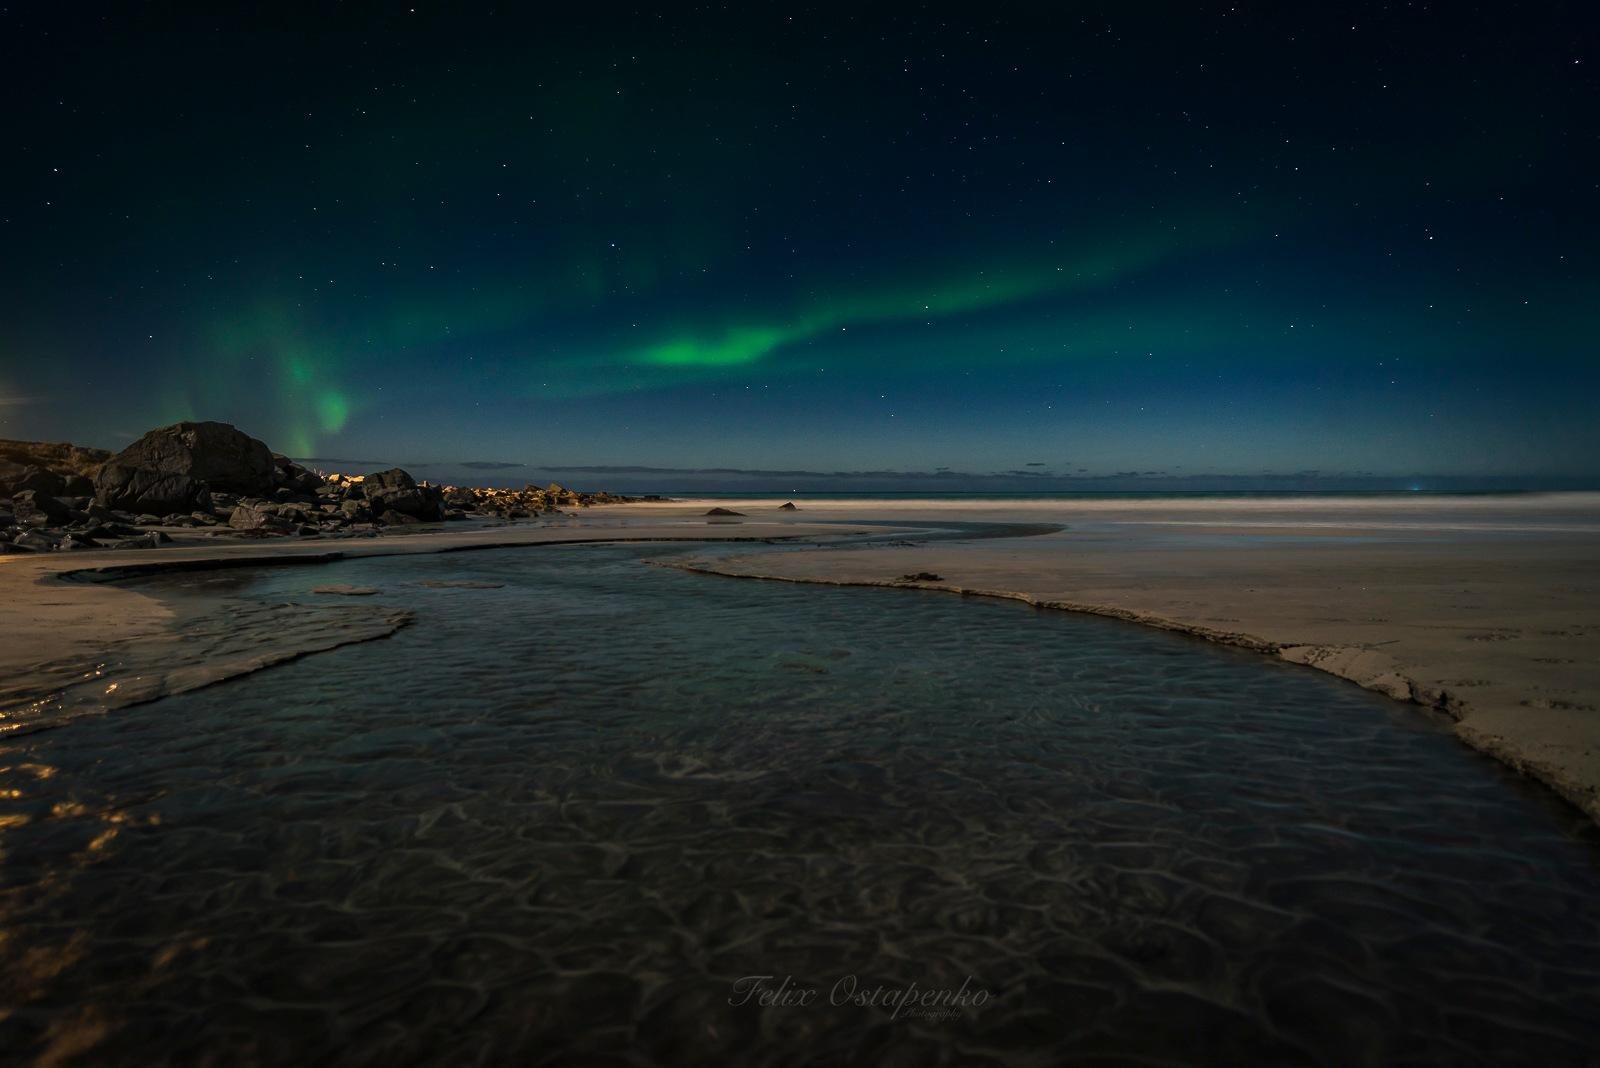 aurora by Felix Ostapenko